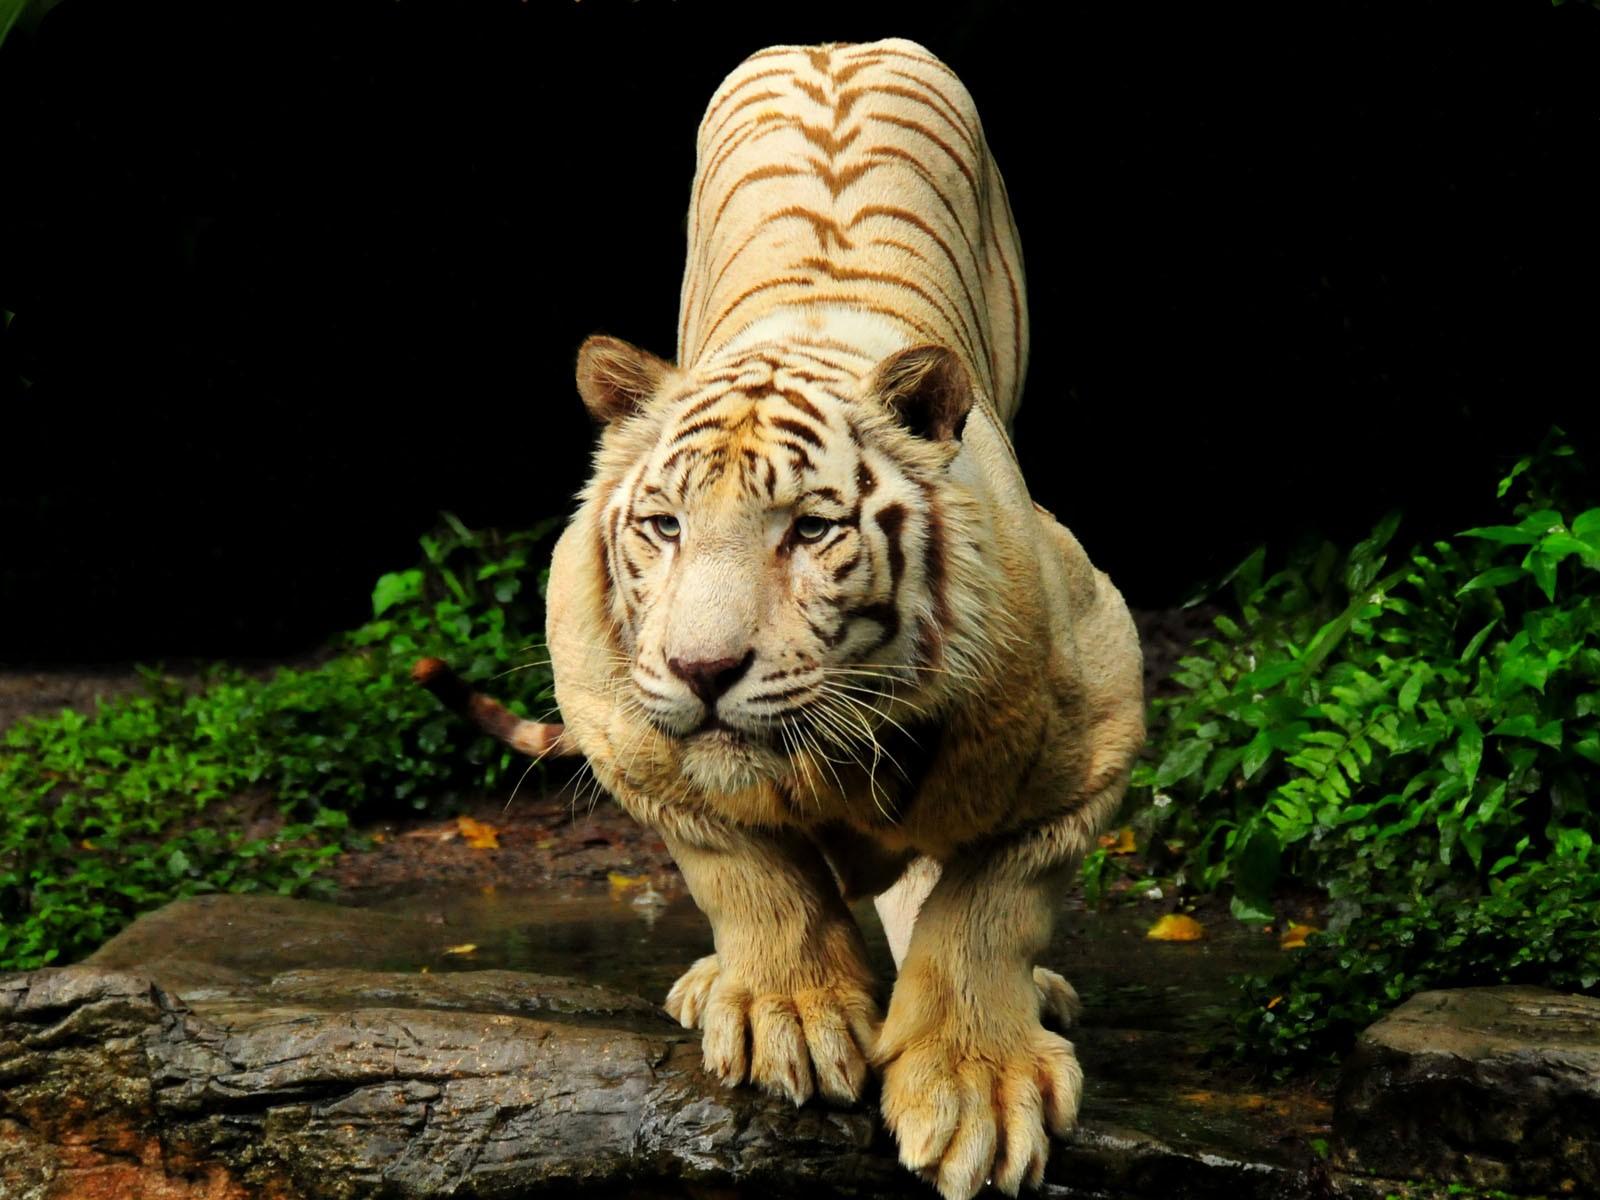 tiger images wallpaper